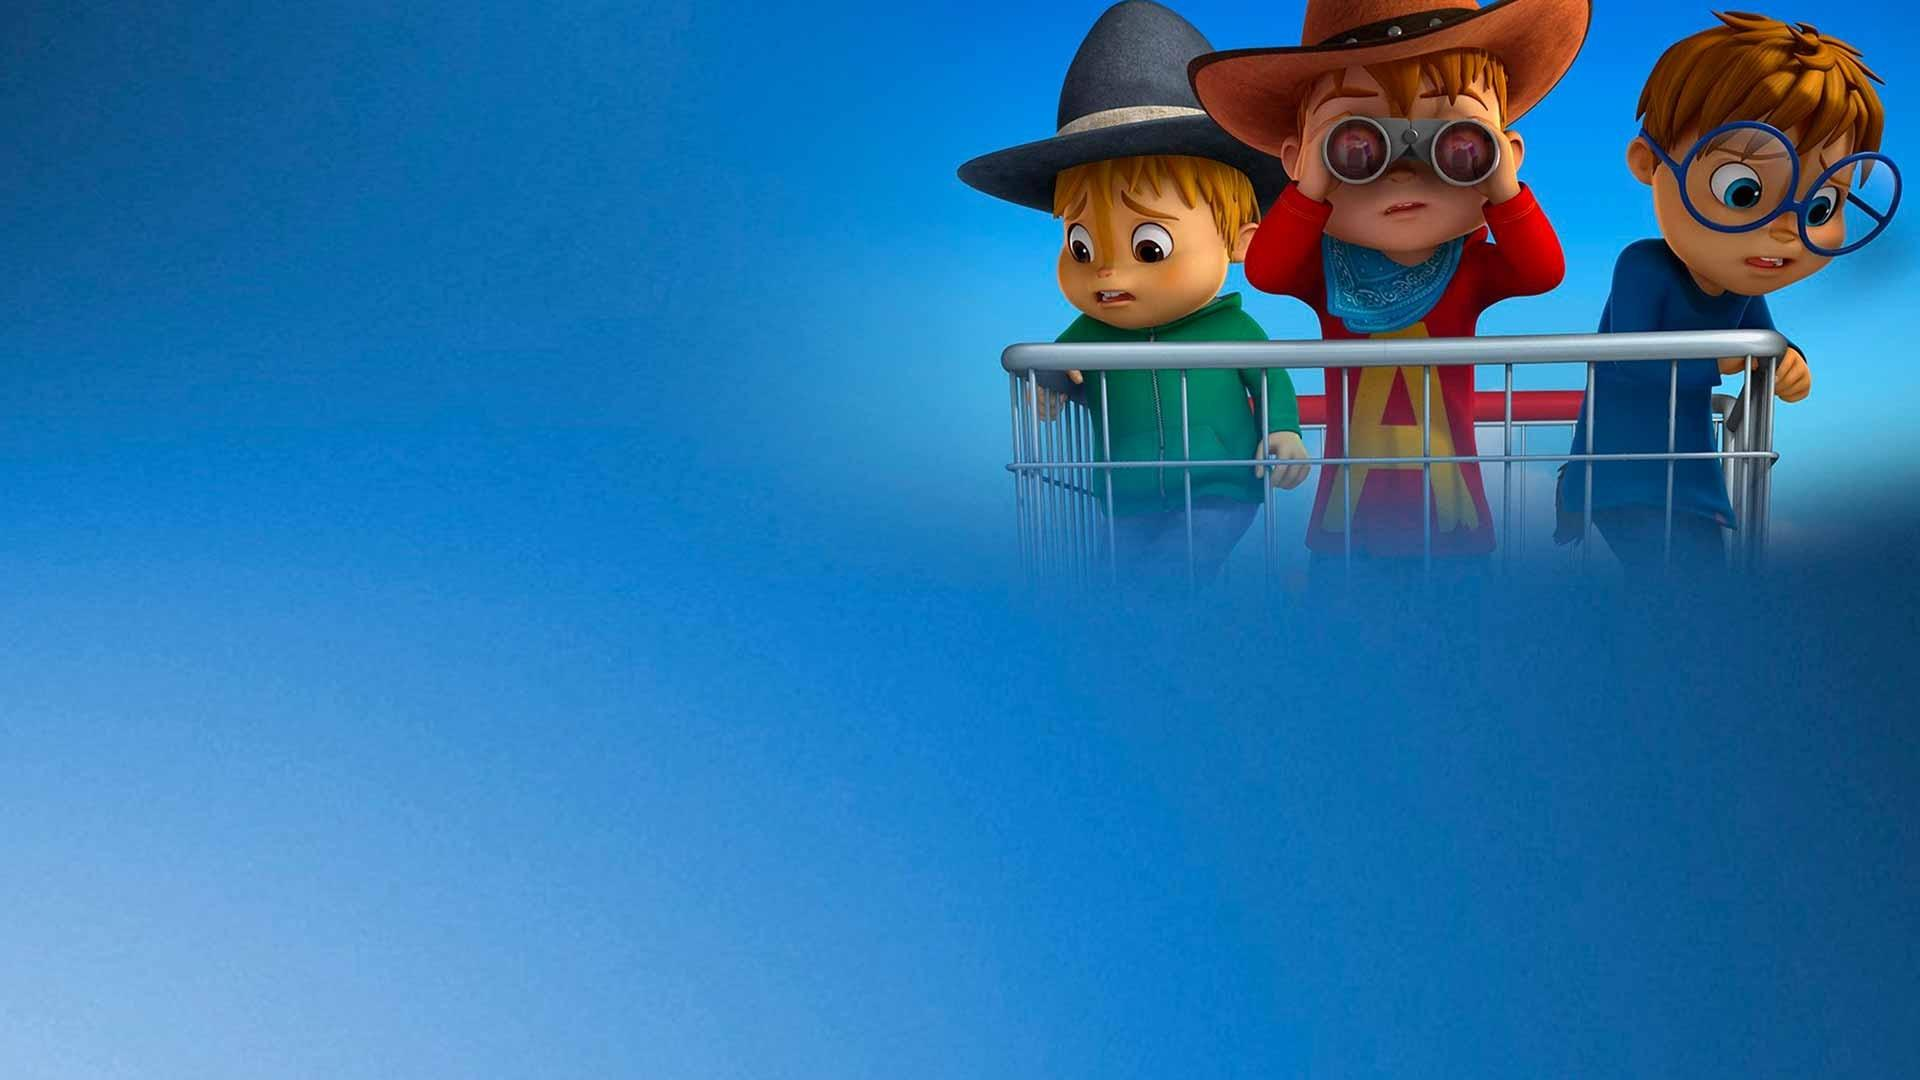 Nickelodeon +1 Alvinnn!!! And the Chipmunks